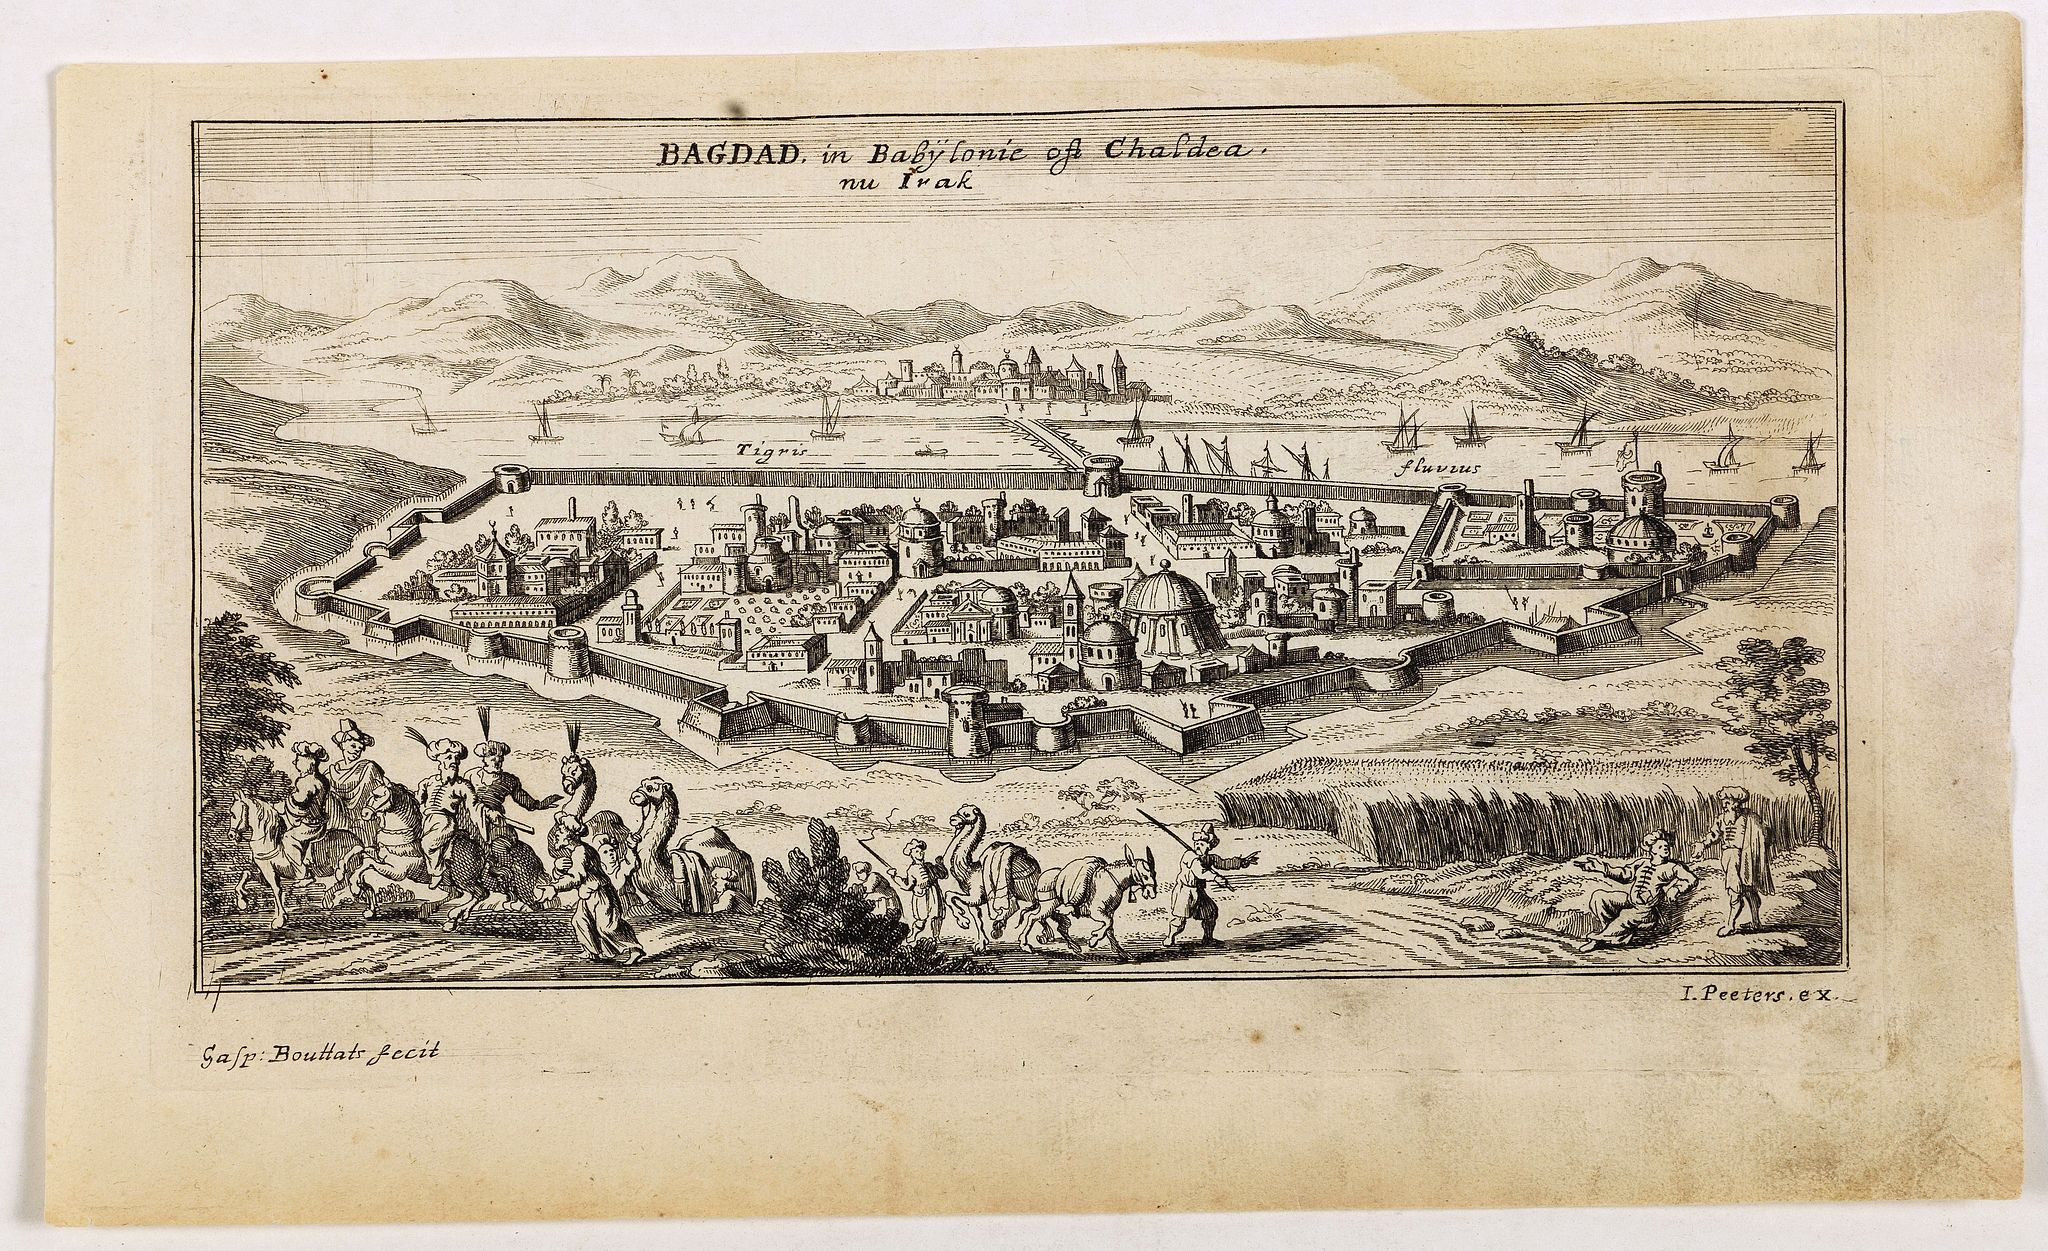 PEETERS, J. / BOUTTATS, G. -  Bagdad, in Babÿlonie of Chaldea nu Irak.